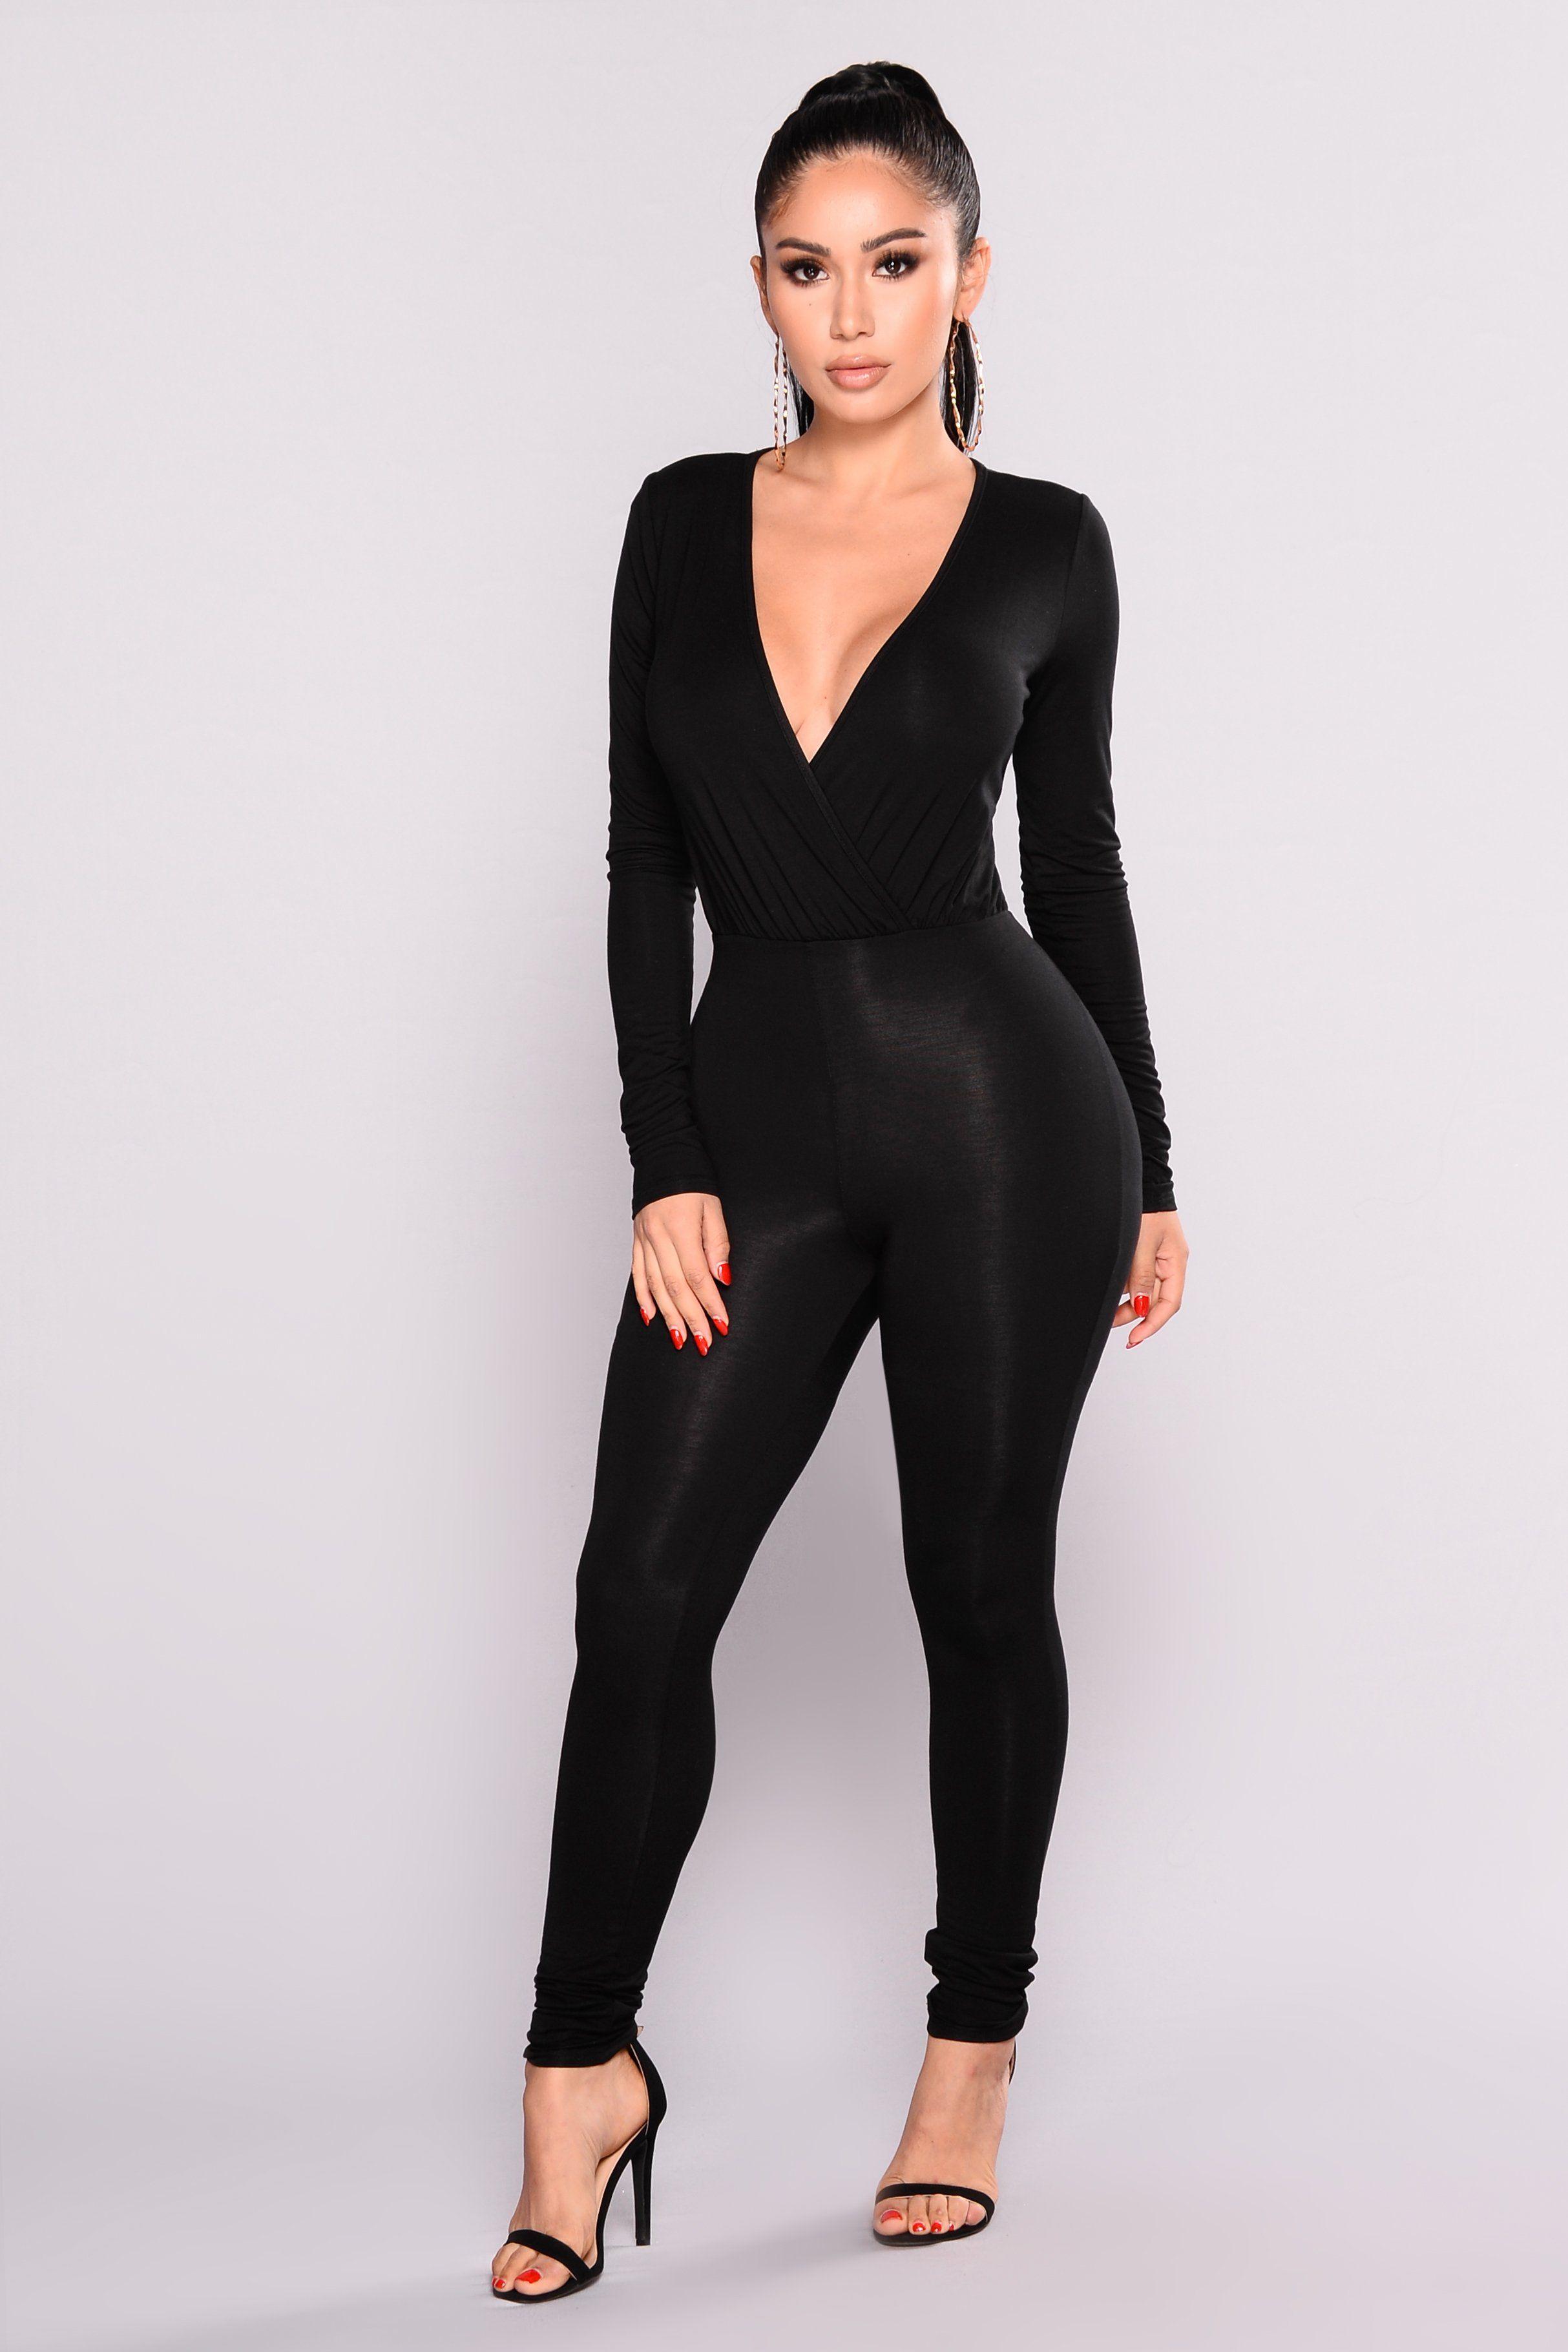 84c728d57f53 Cared For Jumpsuit - Black